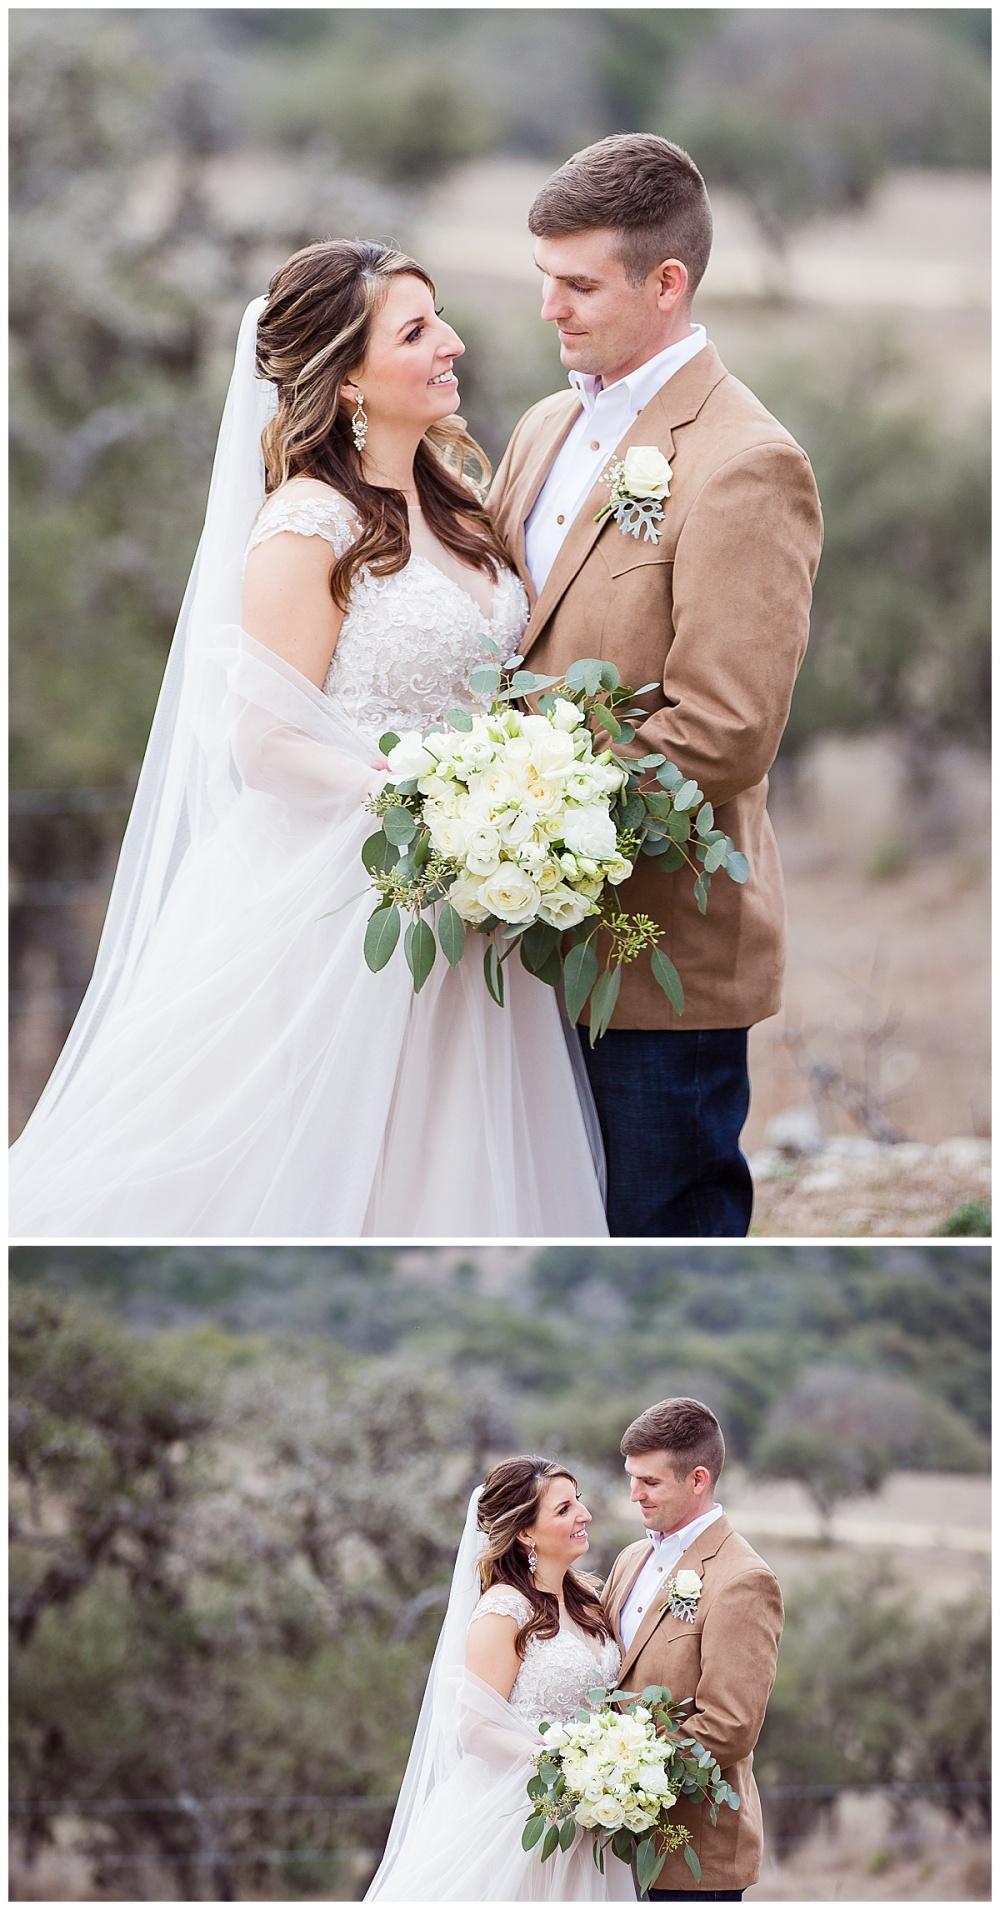 Wedding-Photographer-Texas-Hill-Country-Happy-H-Ranch-Comfor-Texas-Carly-Barton-Photography_0054.jpg